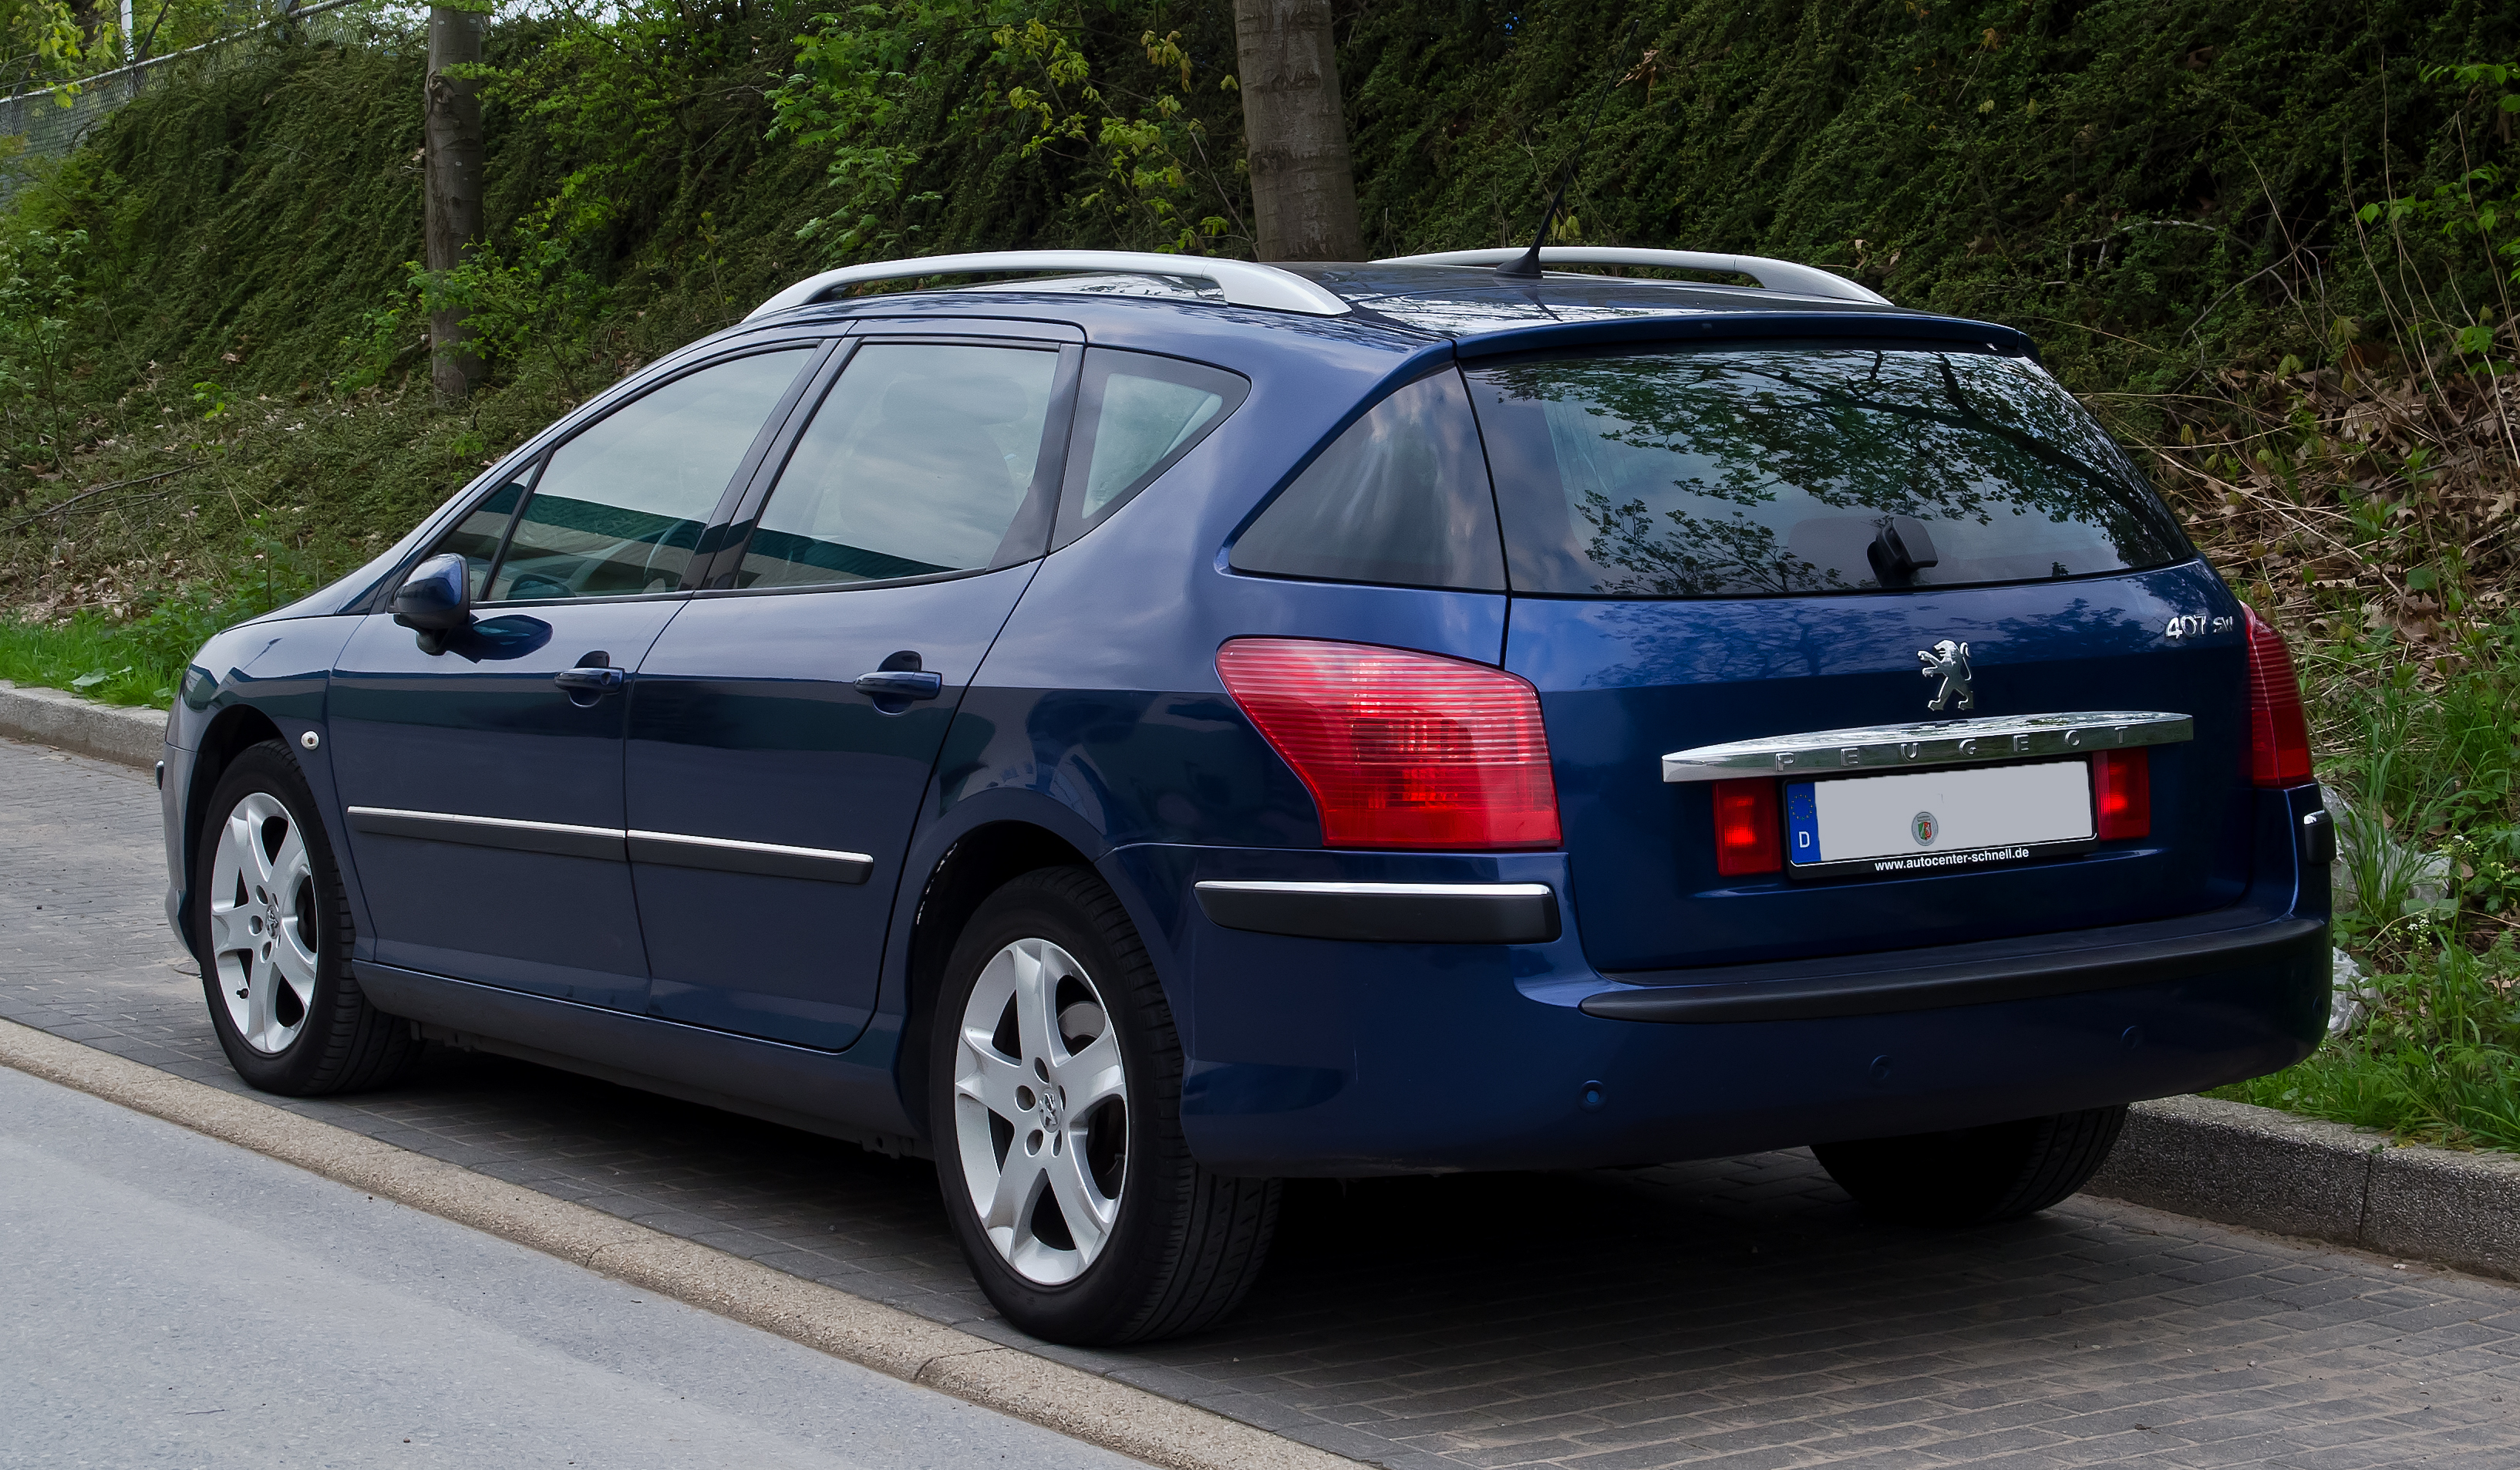 File Peugeot 407 Sw Facelift Heckansicht 3 Mai 2012 Wulfrath Jpg Wikipedia